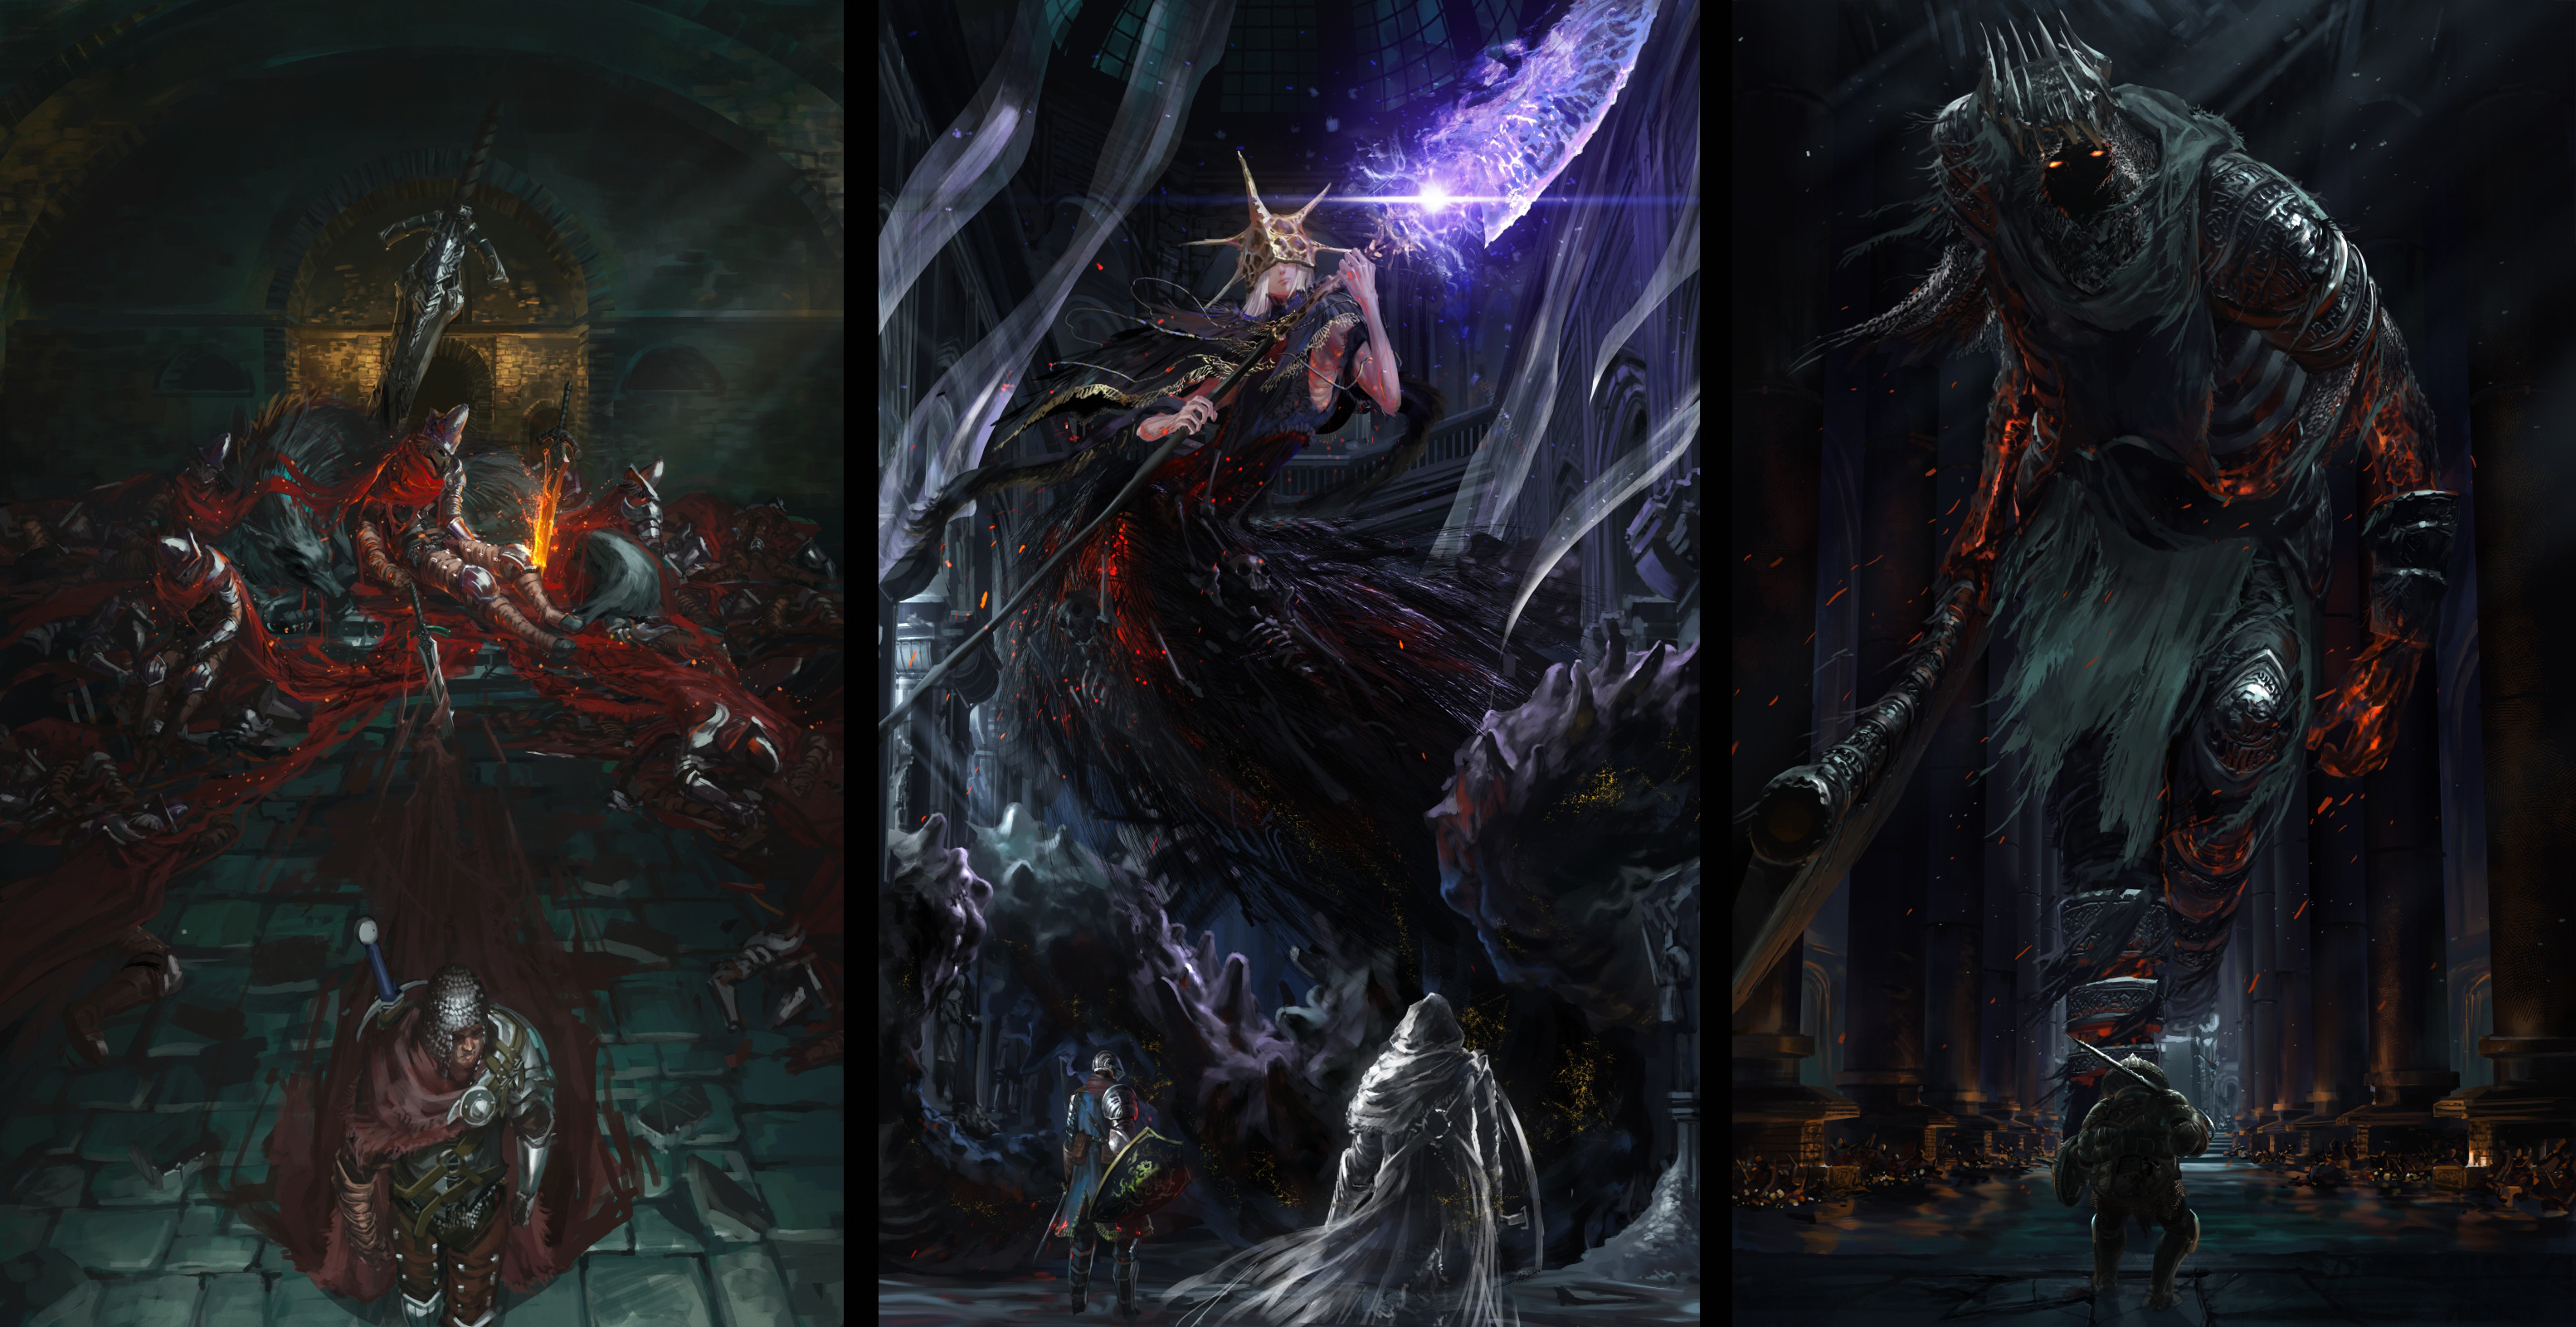 Dark souls 3 – The lords of cinder by Ishutani